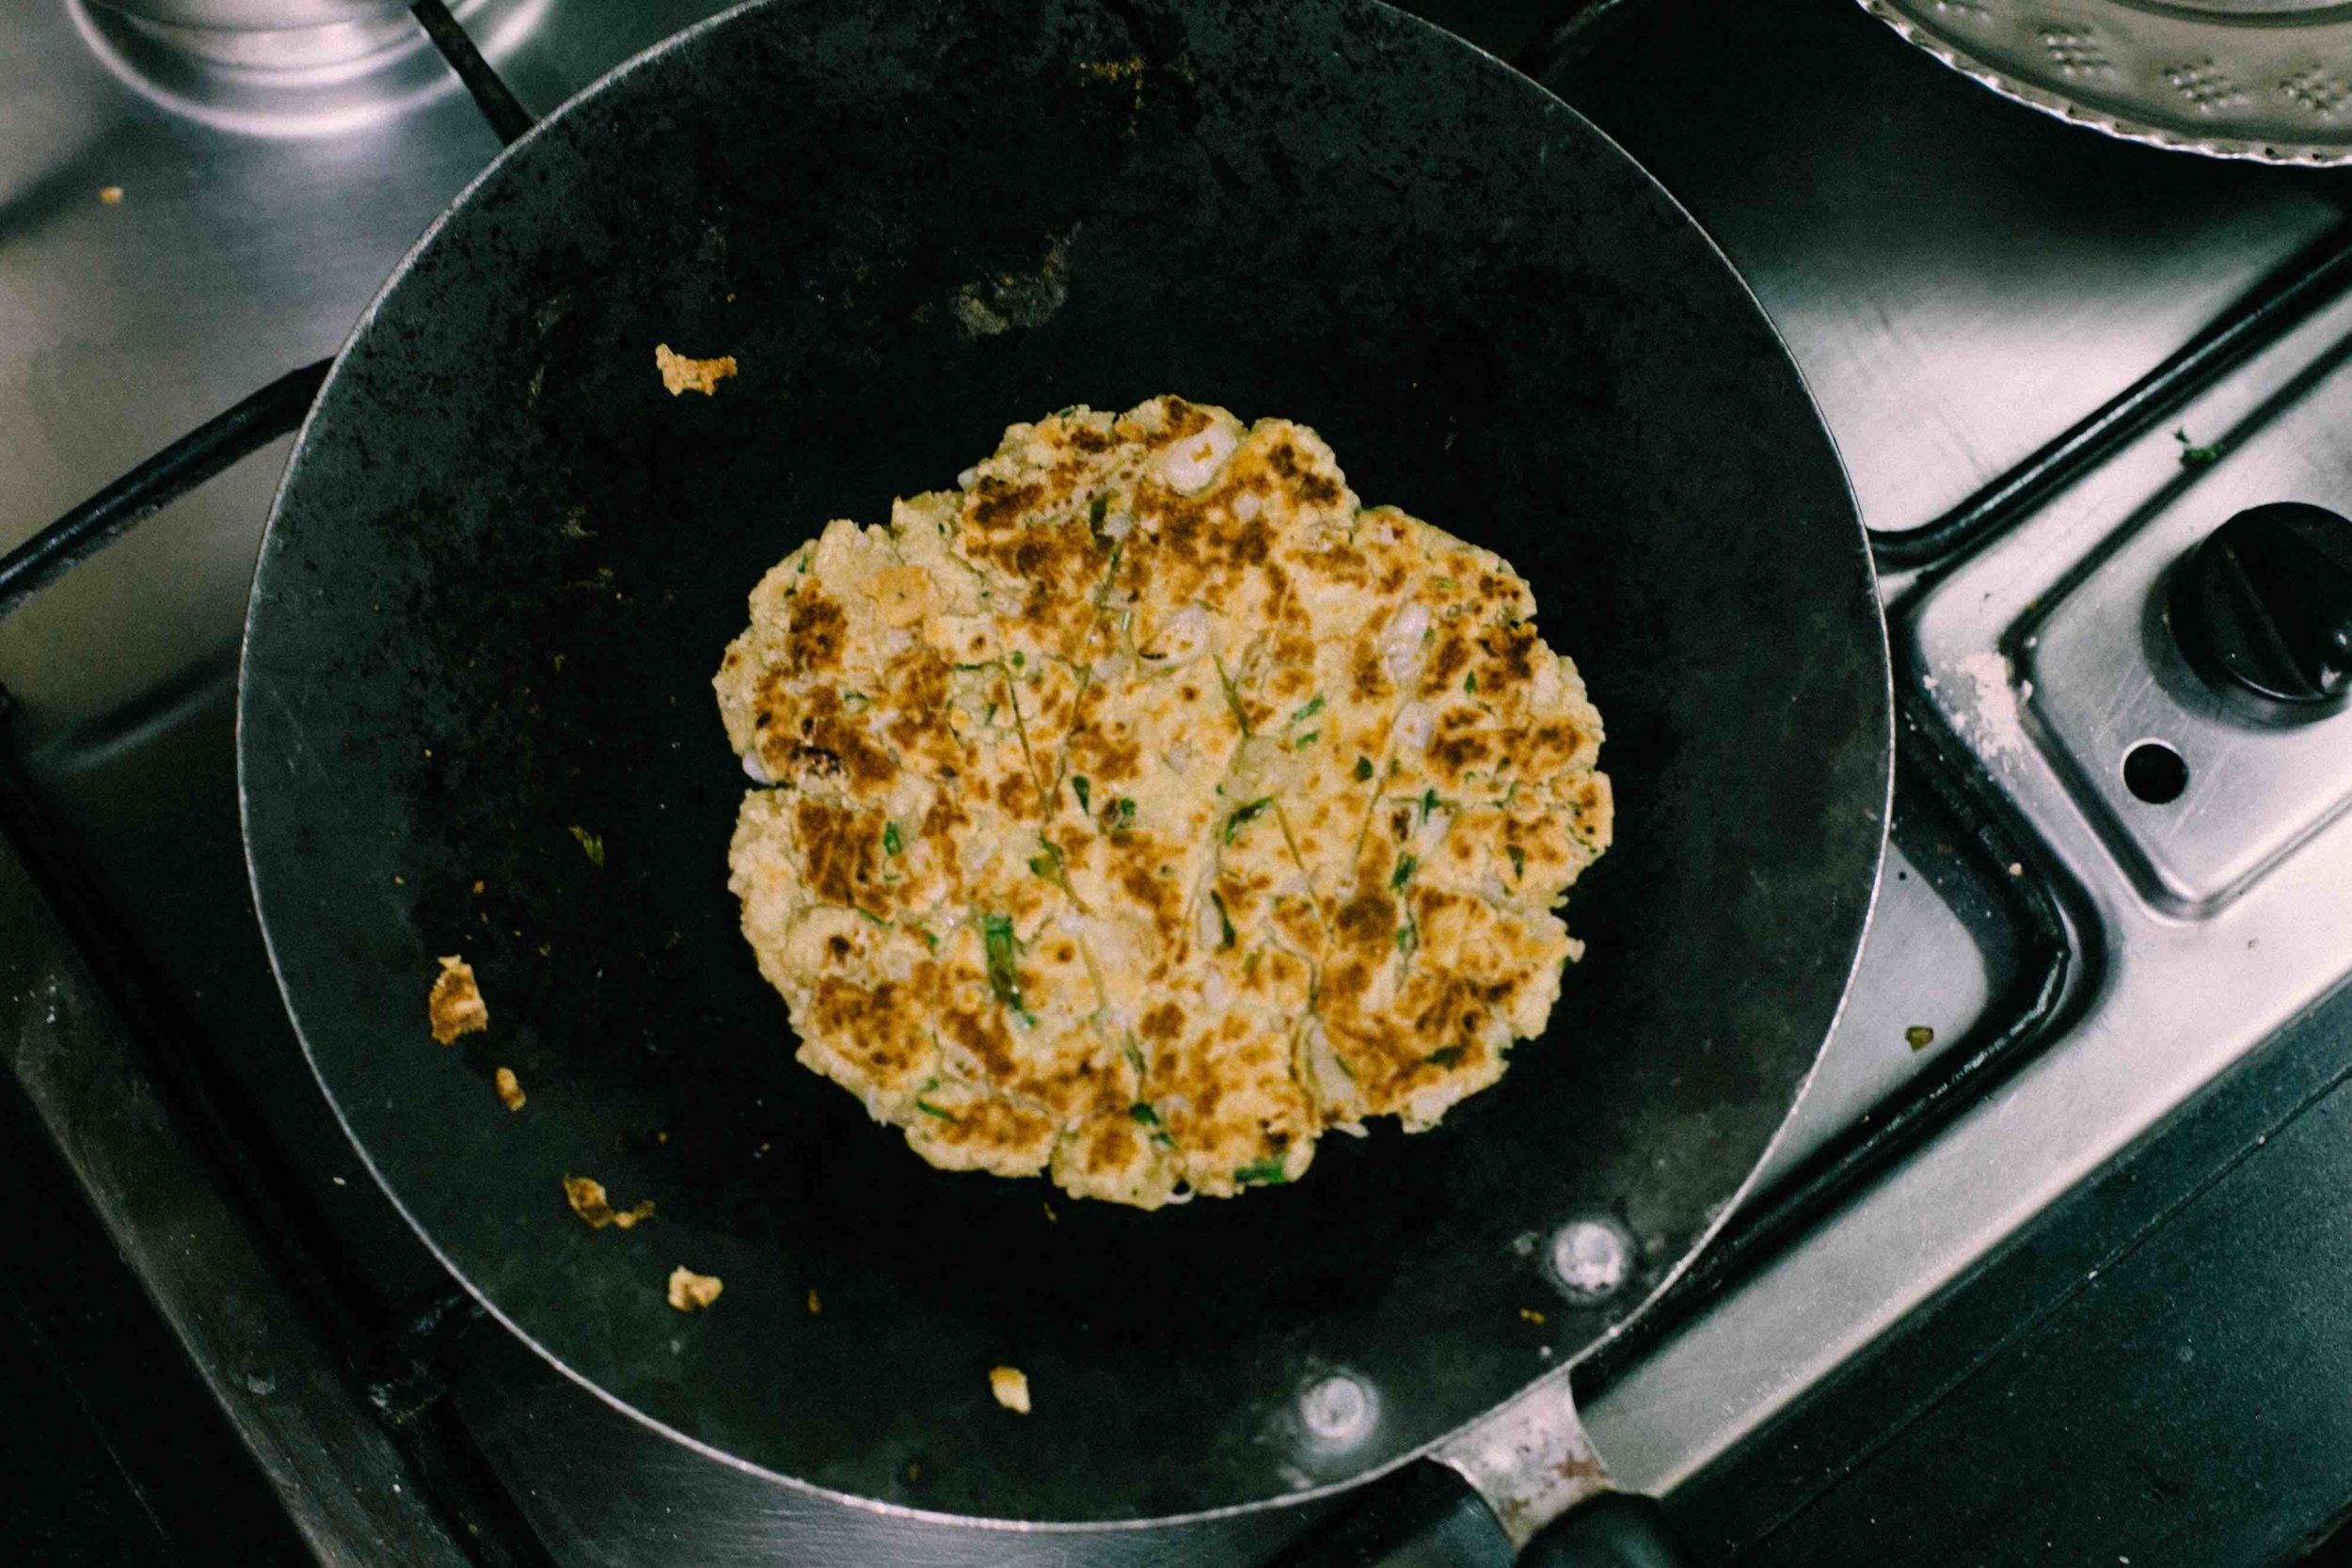 Hena Gulabani shares her recipe for koki or loli, a Sindhi flatbread